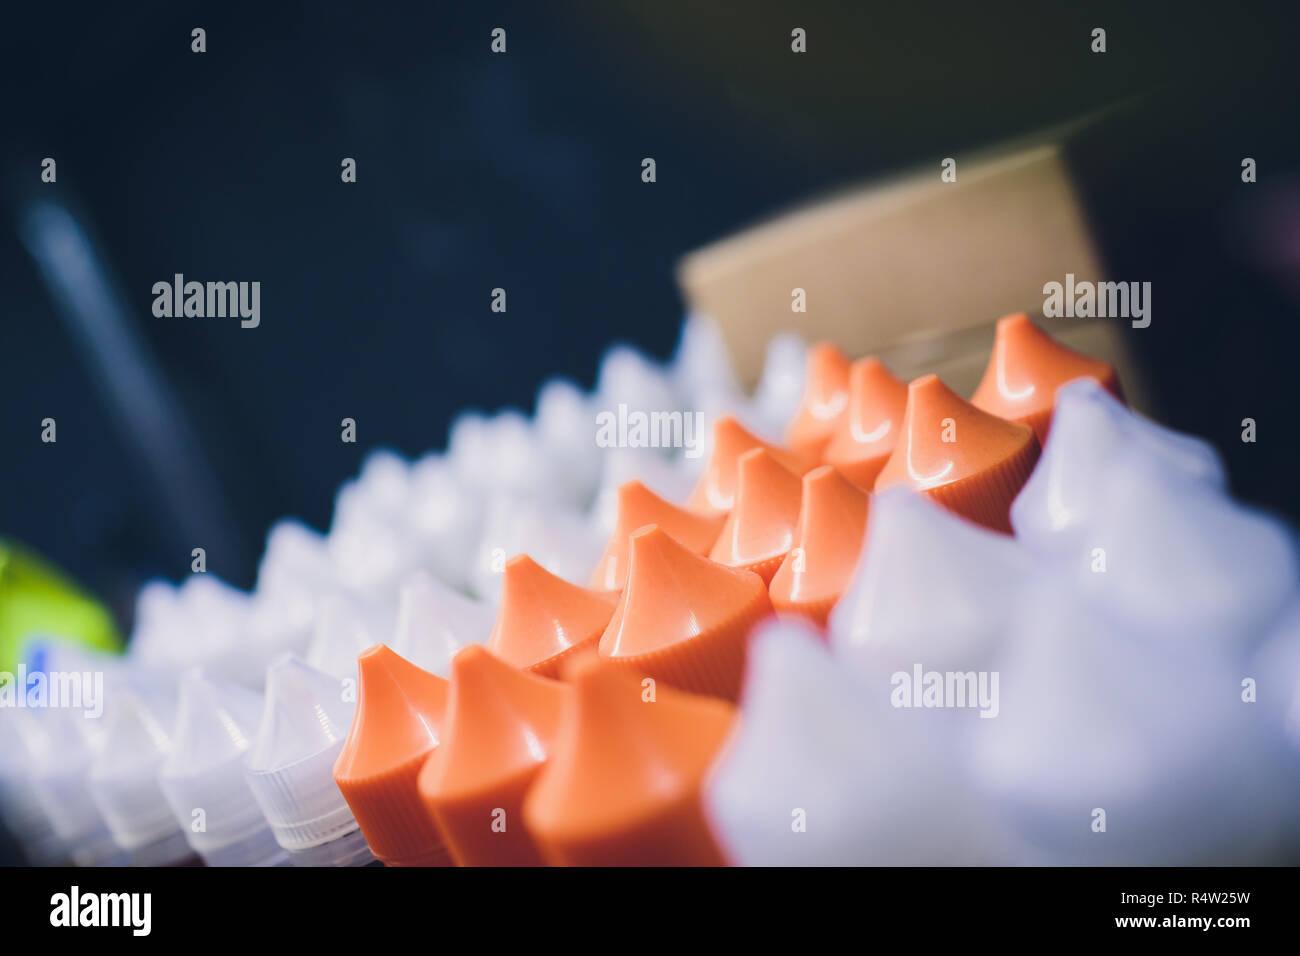 Flavor for electronic cigarette bottle liquid vape. - Stock Image